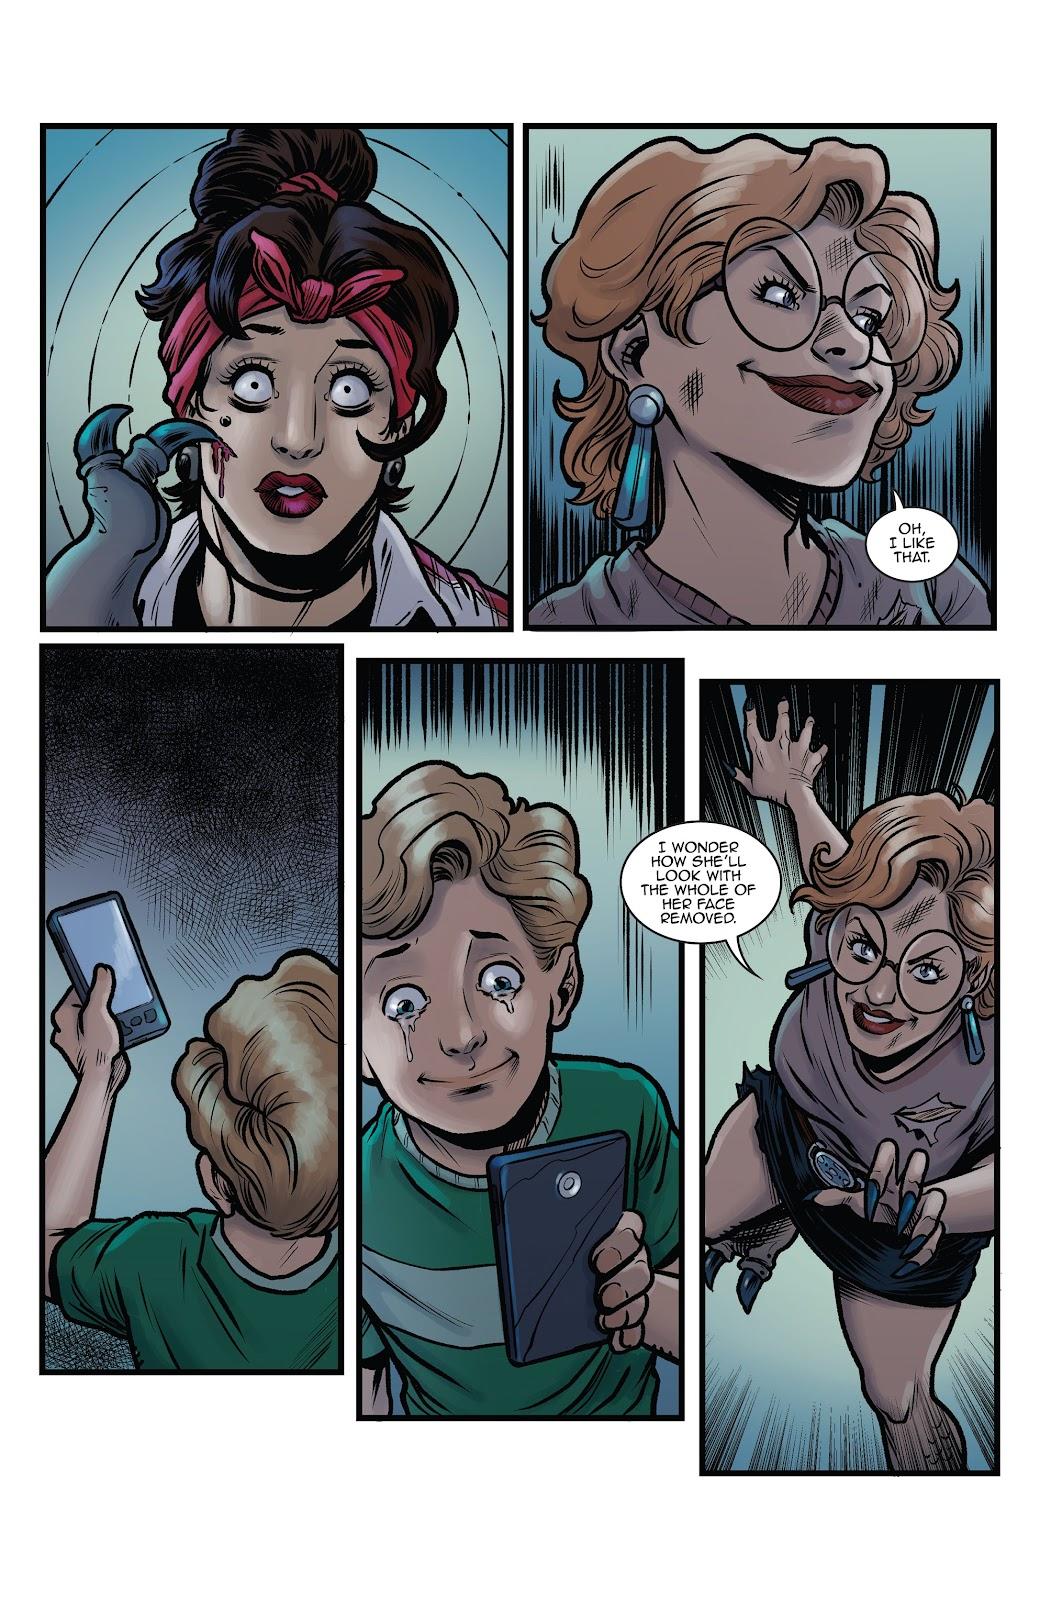 Read online Black Betty comic -  Issue #8 - 6